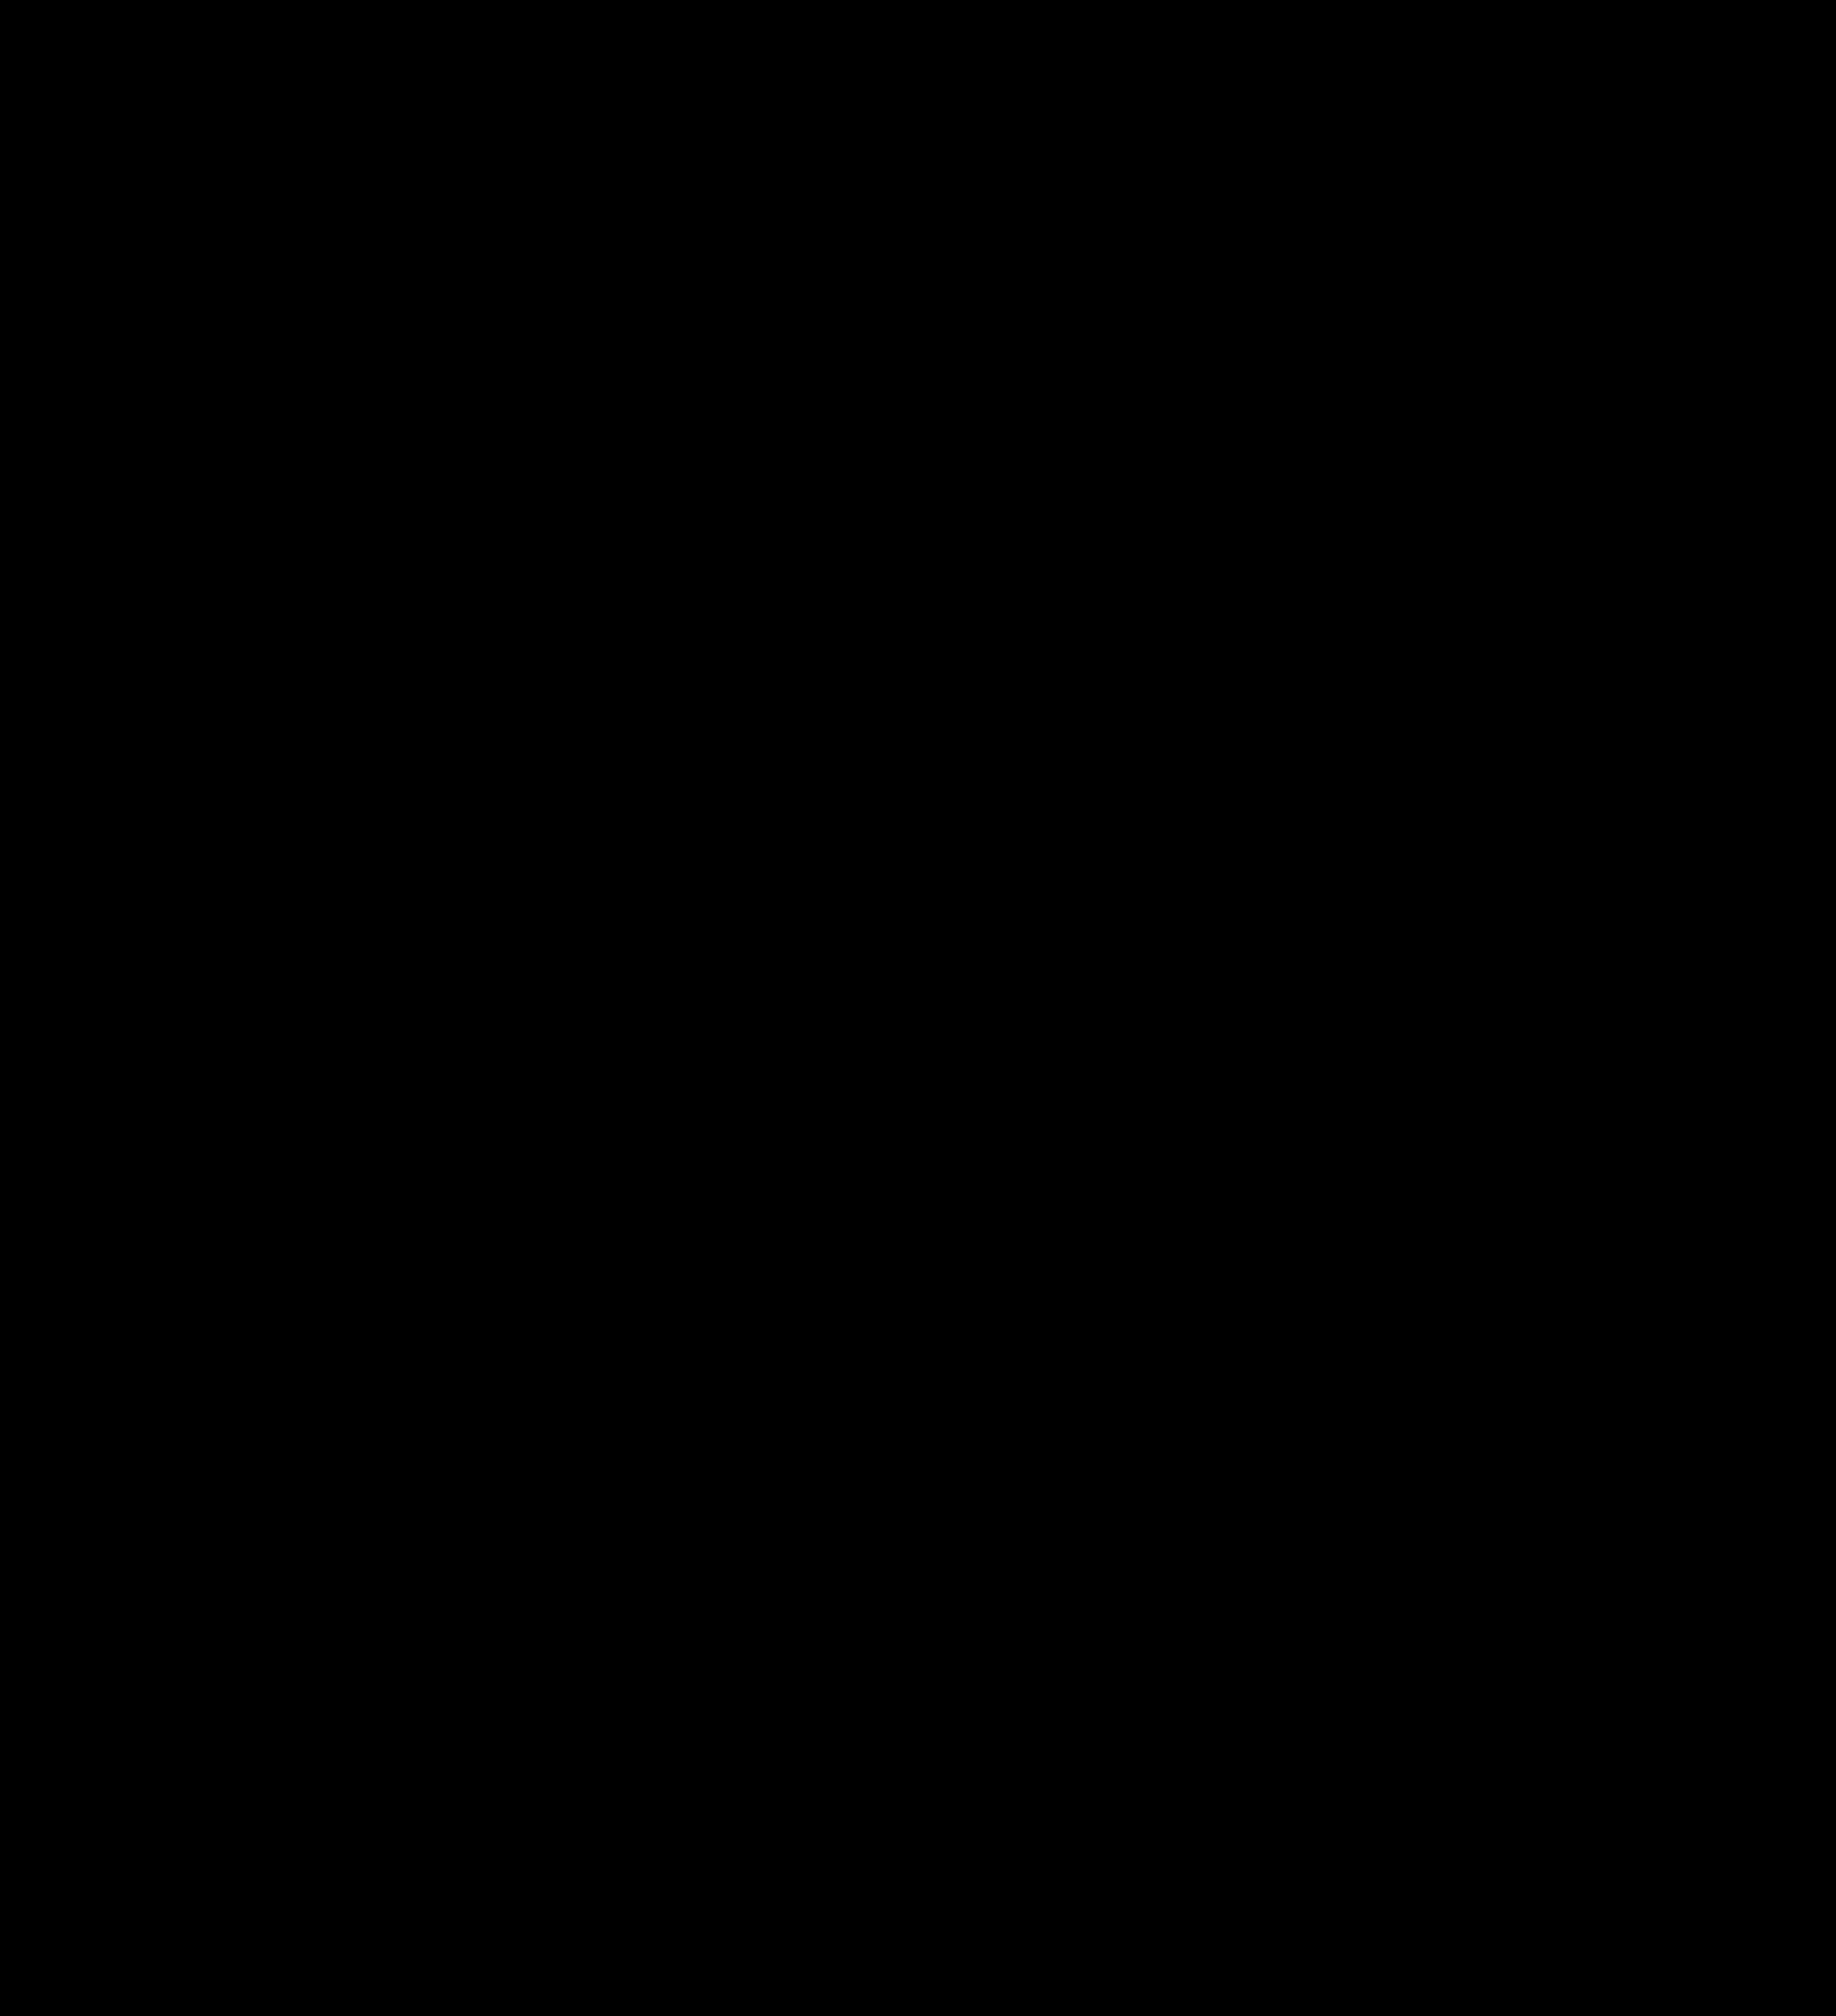 Meg_logo_10in.png